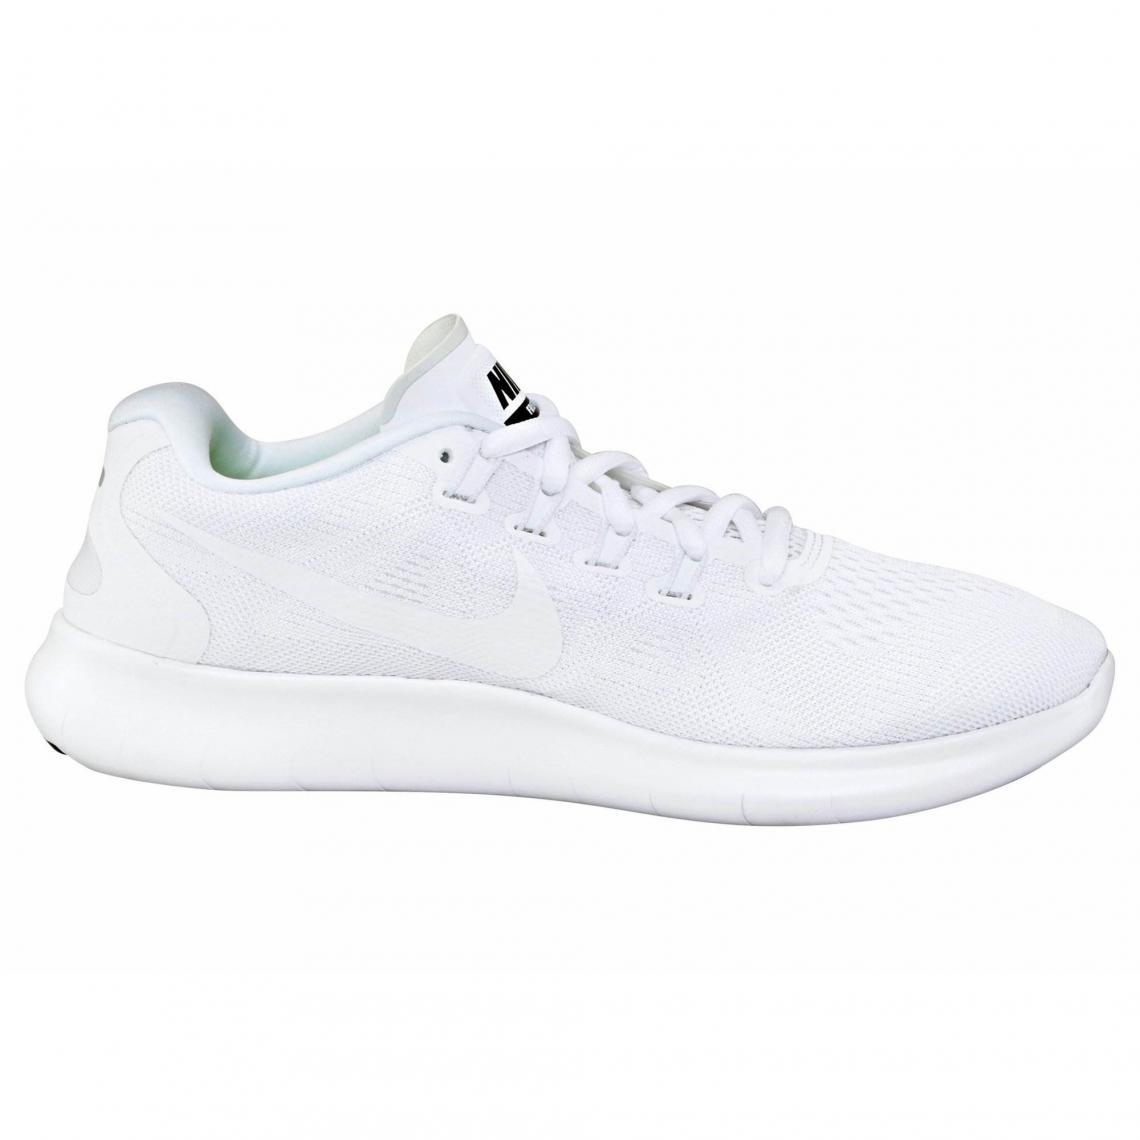 96454cb8c54b Nike Free Run 2 chaussures de sport femme - Blanc | 3 SUISSES